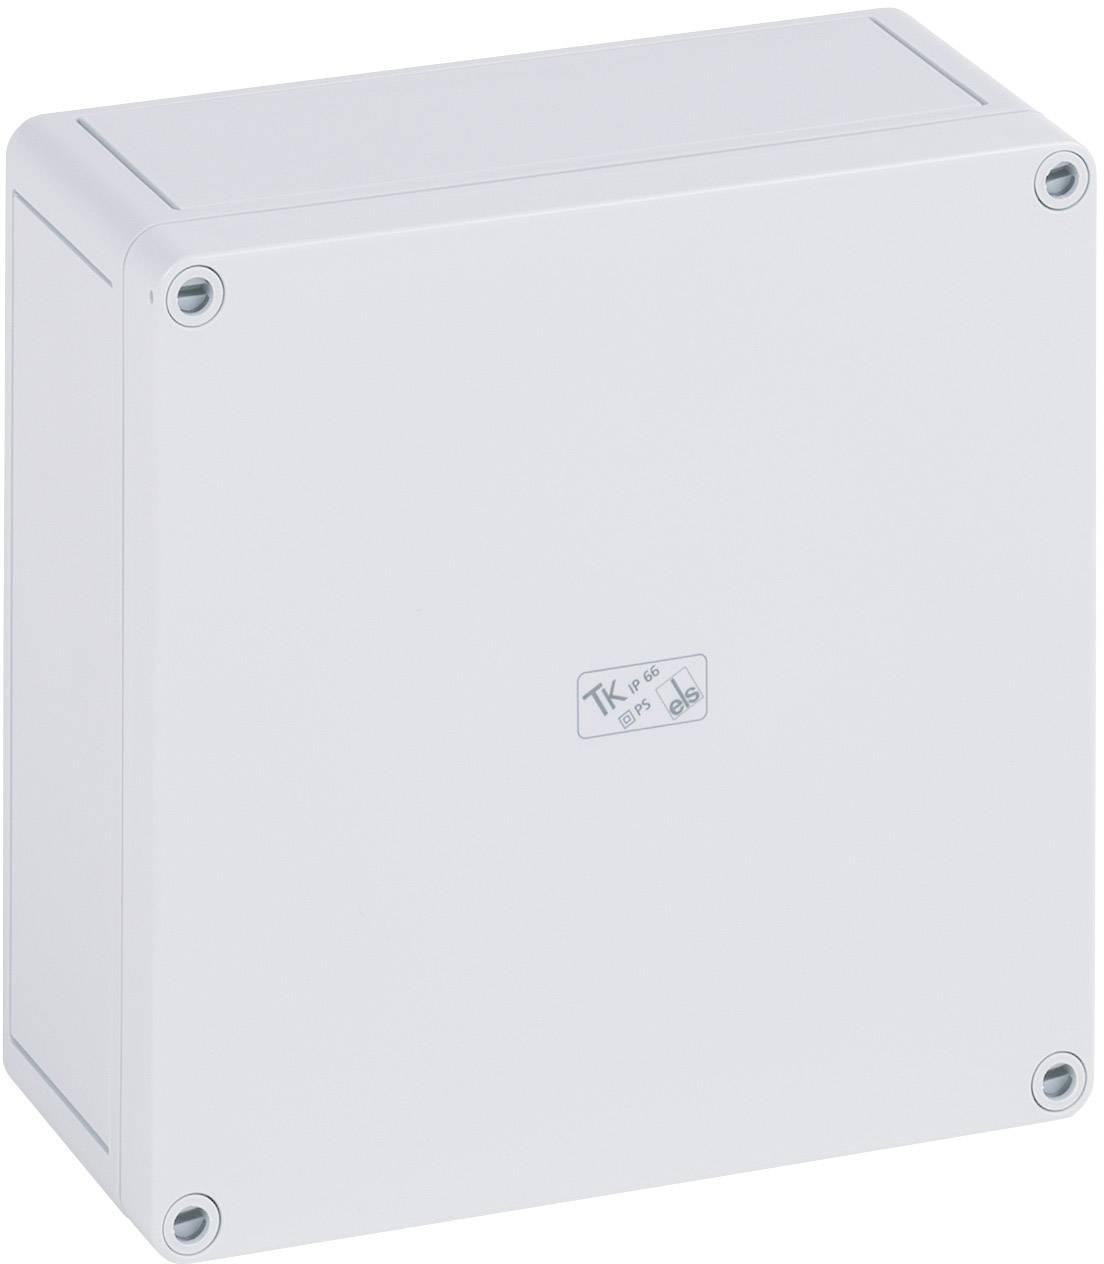 Inštalačná krabička Spelsberg TK PS 1313-10 11090501, (d x š x v) 130 x 130 x 99 mm, polystyrén, svetlo sivá (RAL 7035), 1 ks